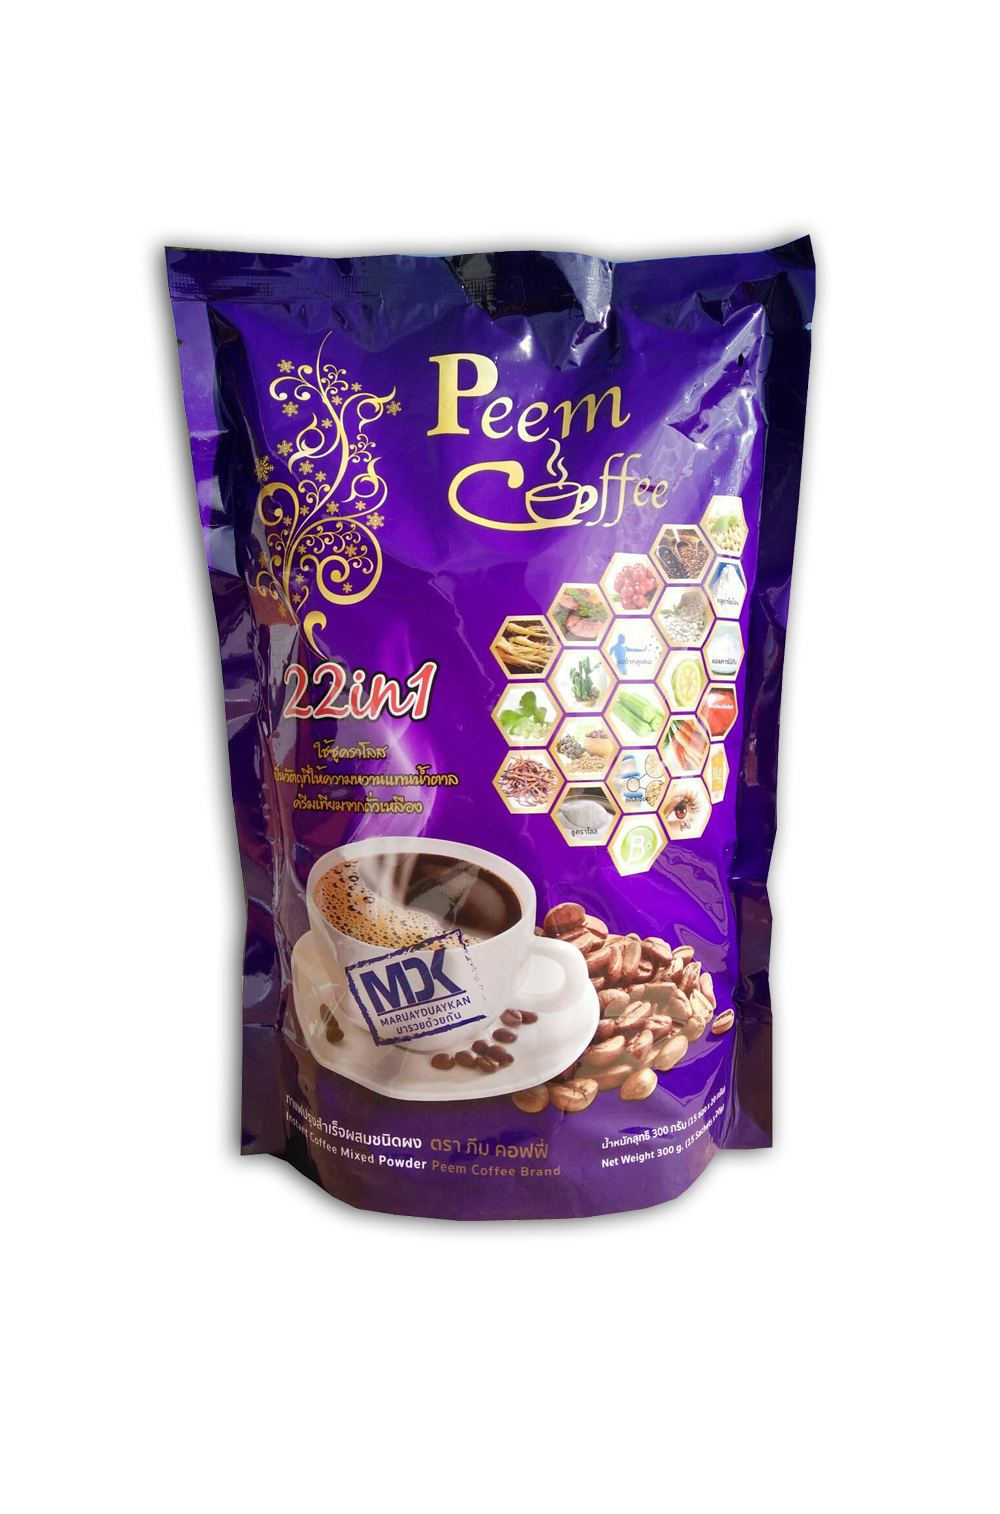 Peem Coffee 22 in 1 (ลูกค้าทั่วไป)